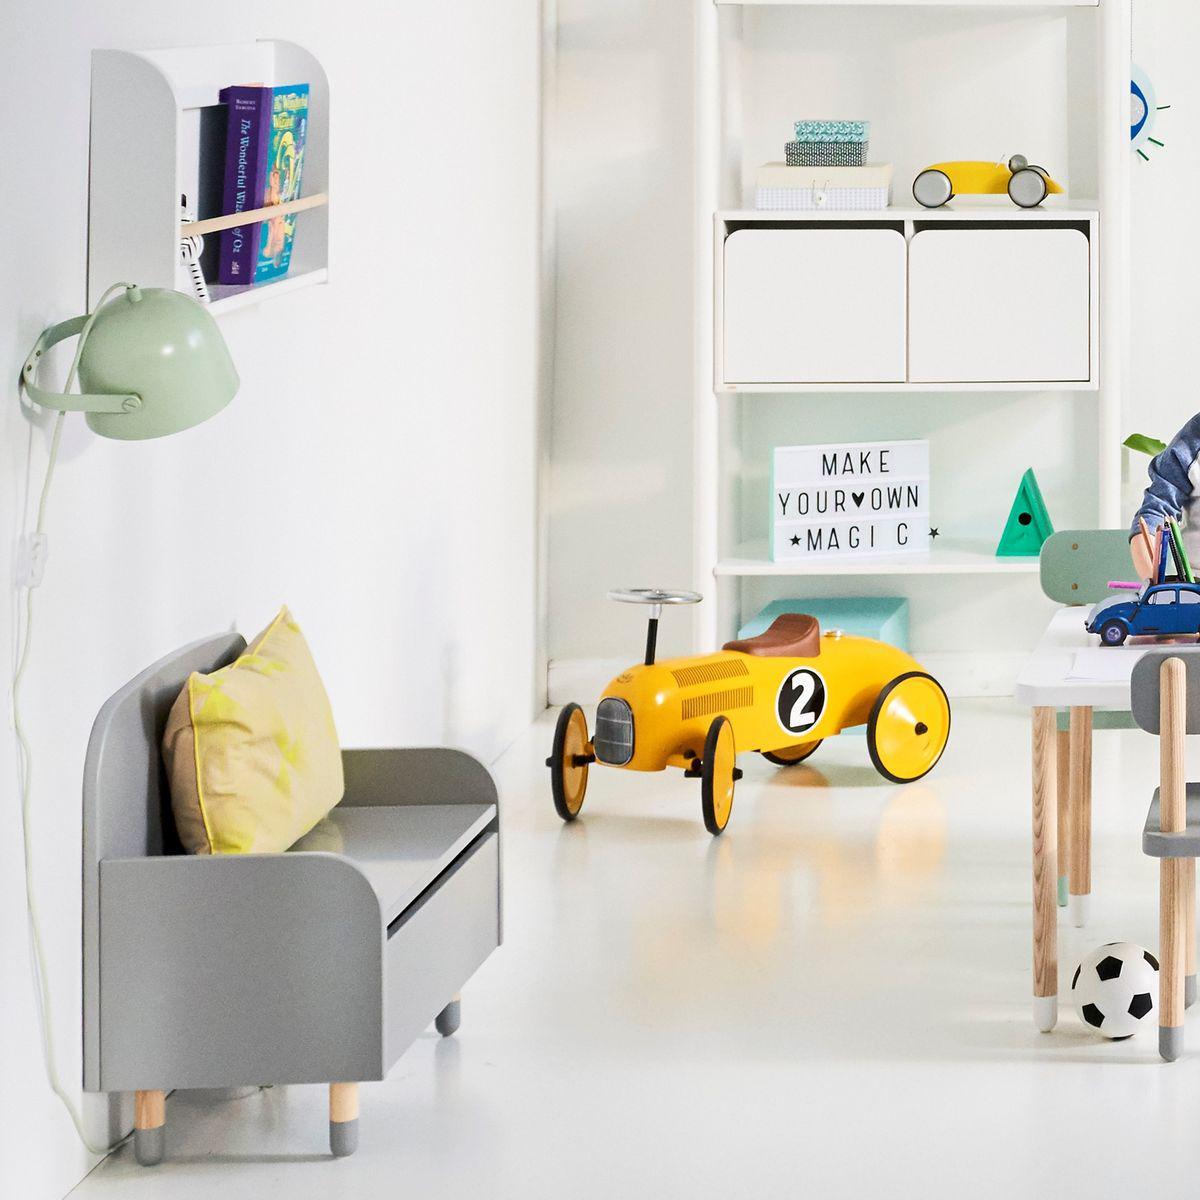 abitare etag re murale enfant display play flexa. Black Bedroom Furniture Sets. Home Design Ideas